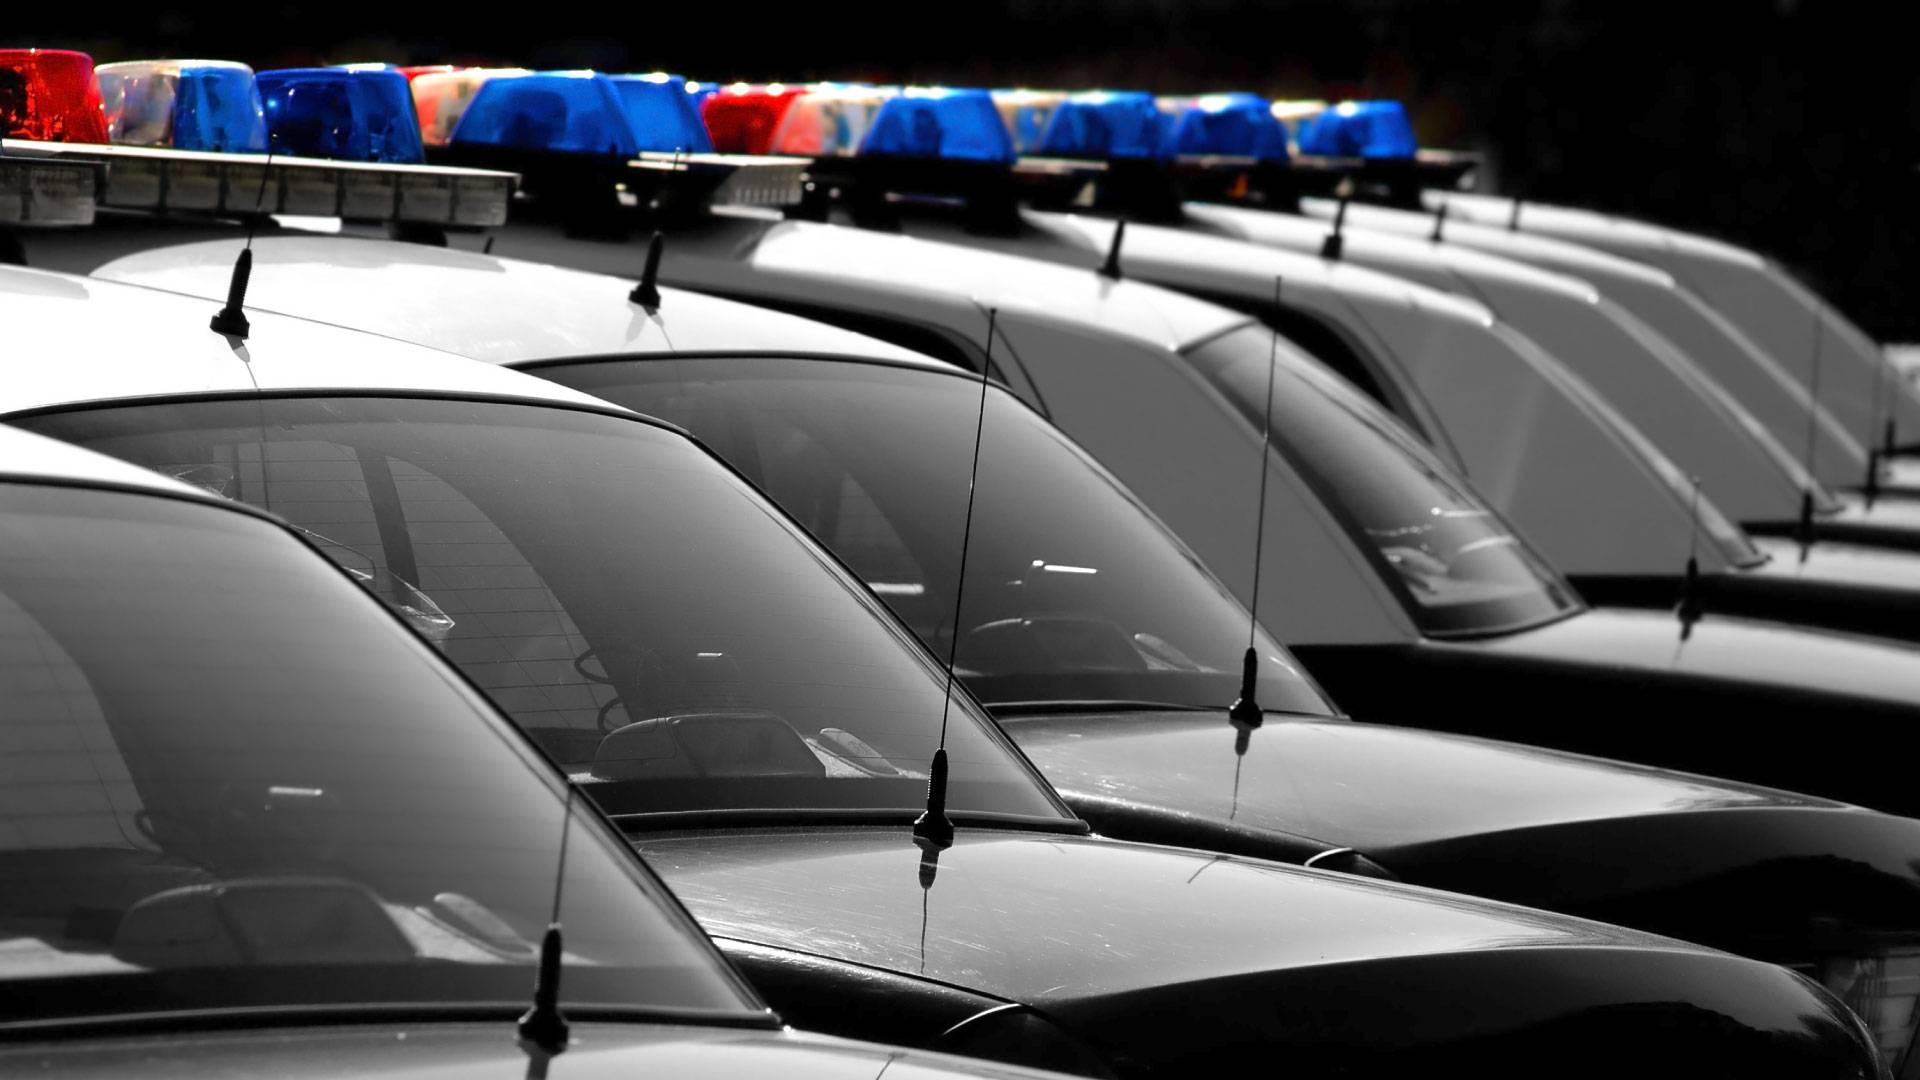 Police misconduct records, public campaign finance